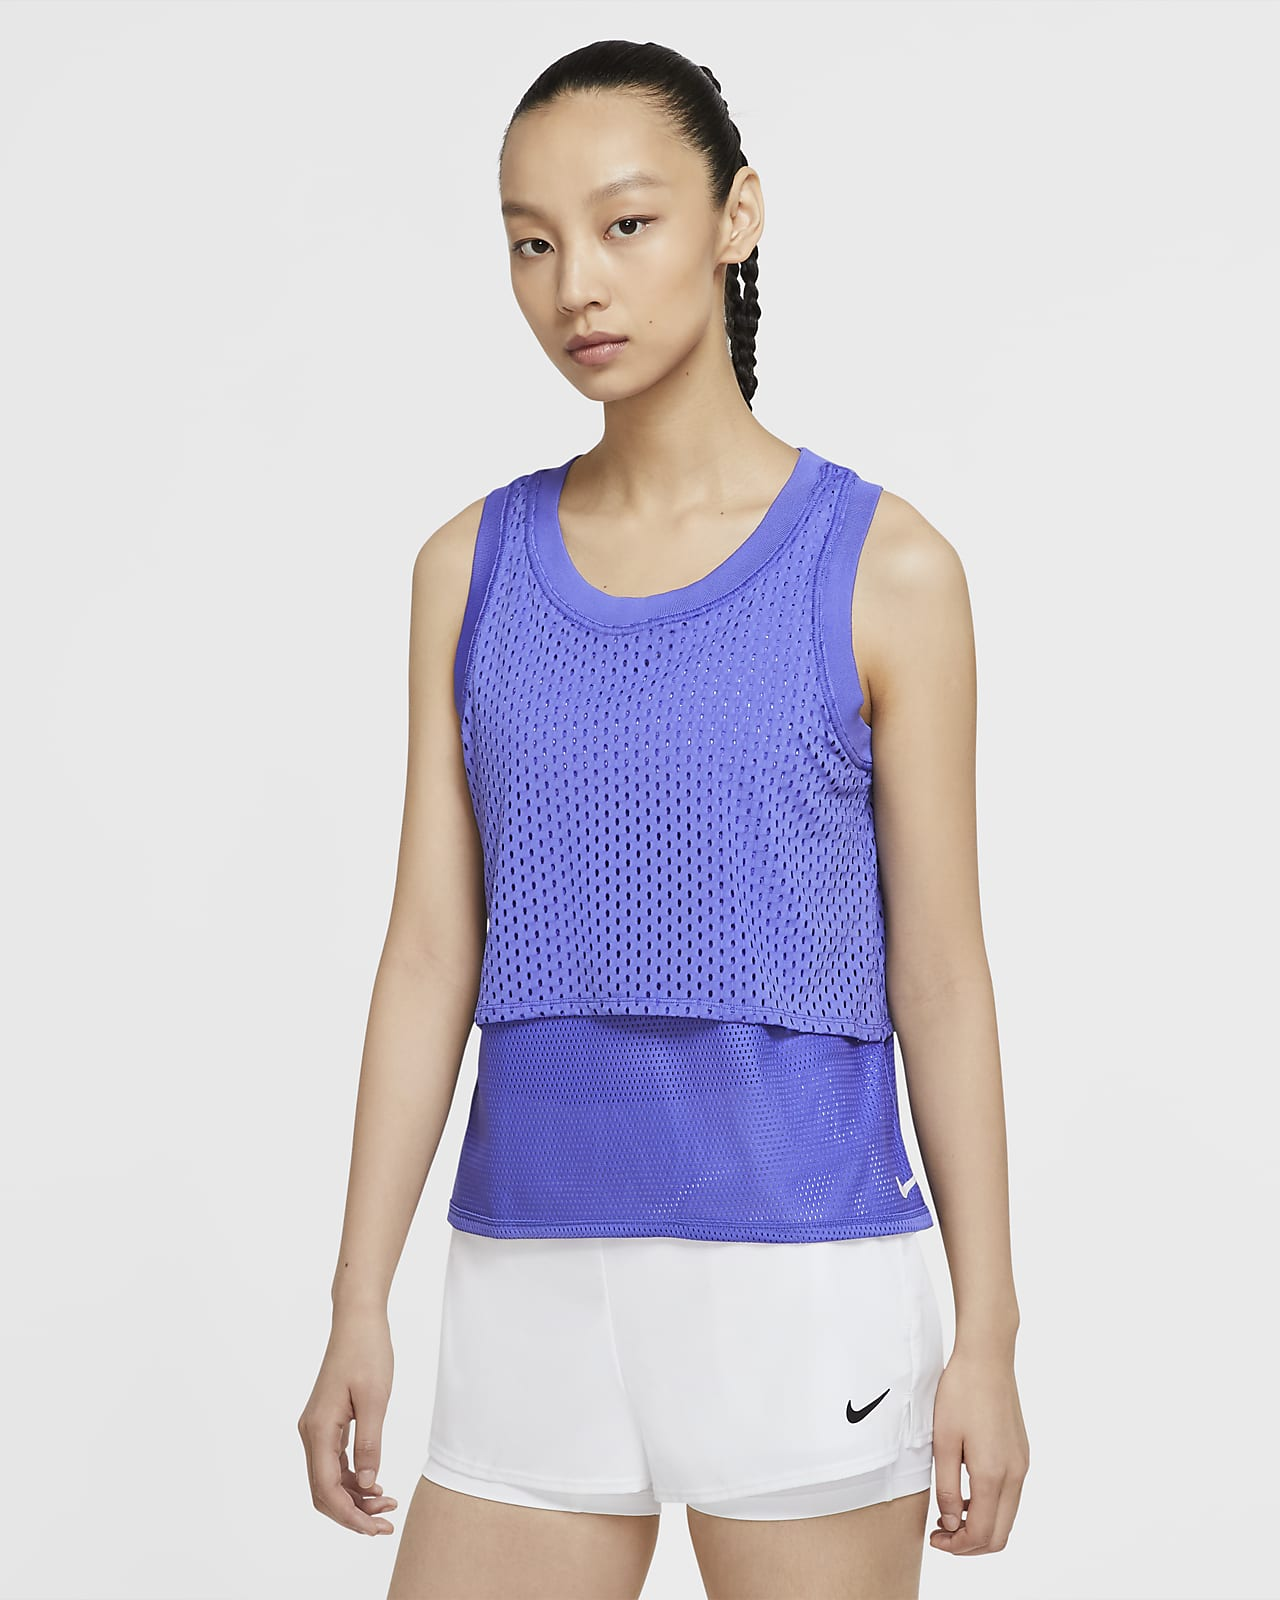 Camiseta de Tirantes Mujer NIKE Dri-fit